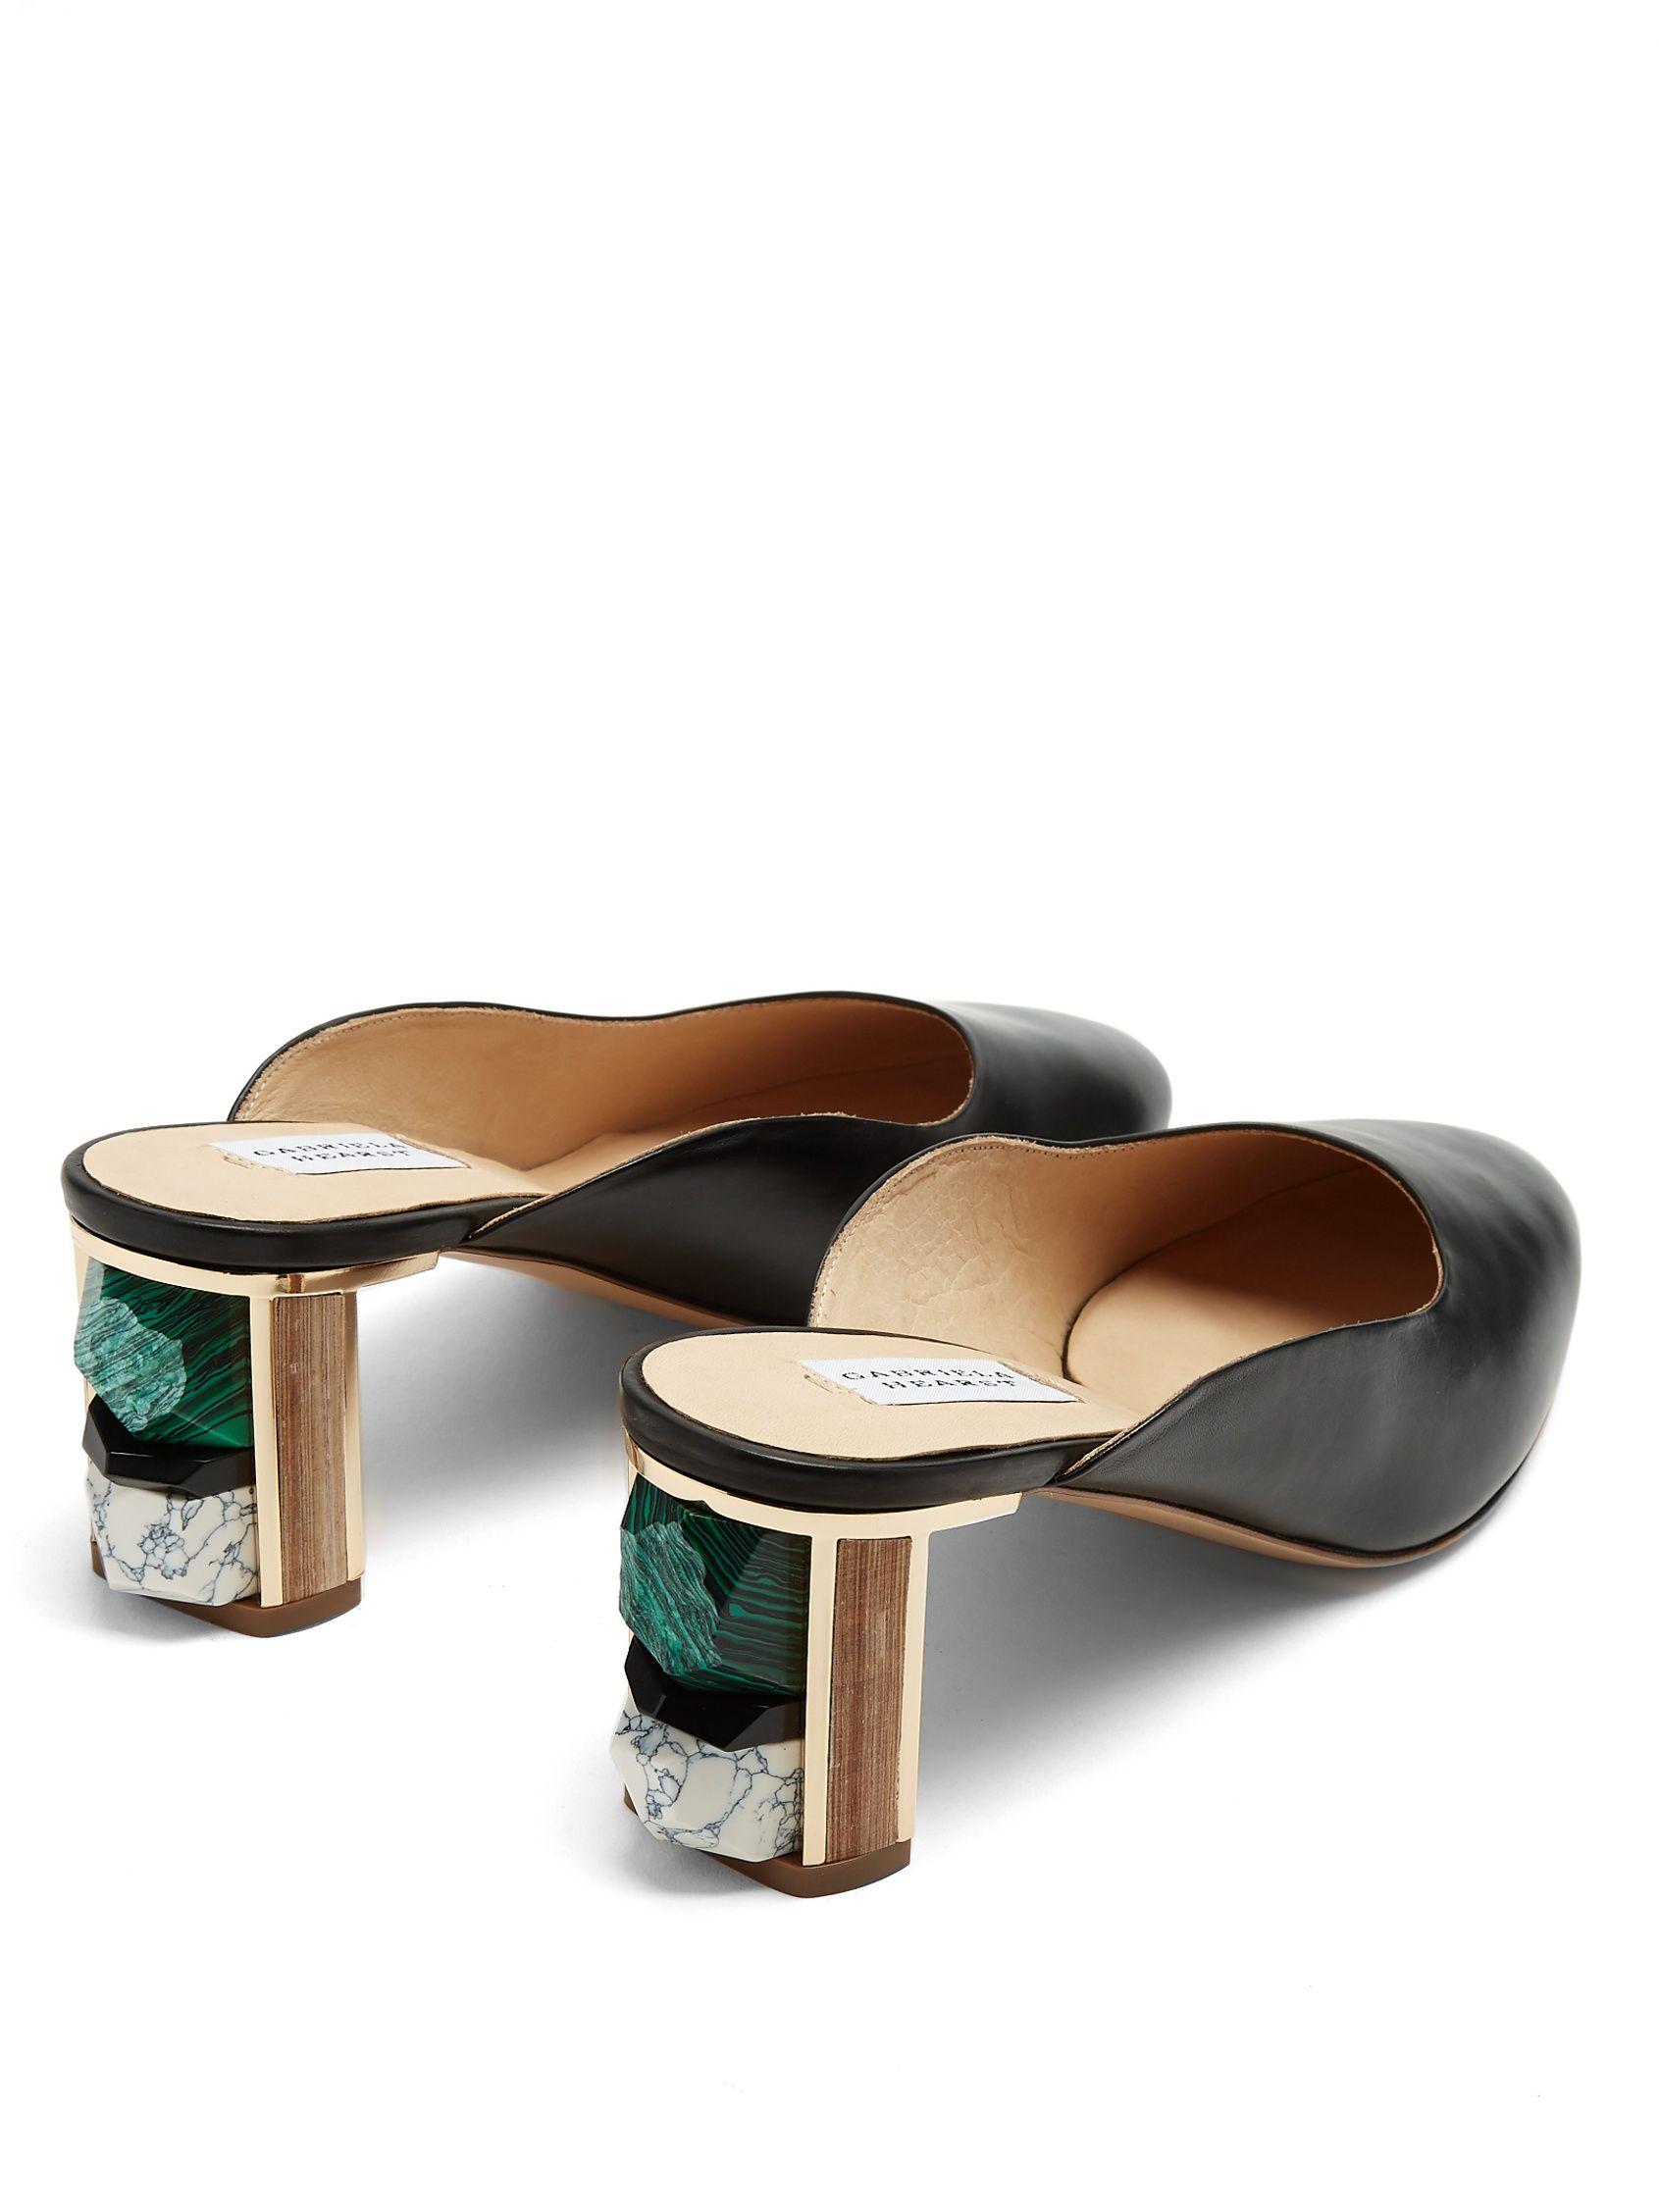 GABRIELA HEARST Lange stone-embellished leather mules Cheap Sale Manchester Discount Footlocker Finishline hLxP5